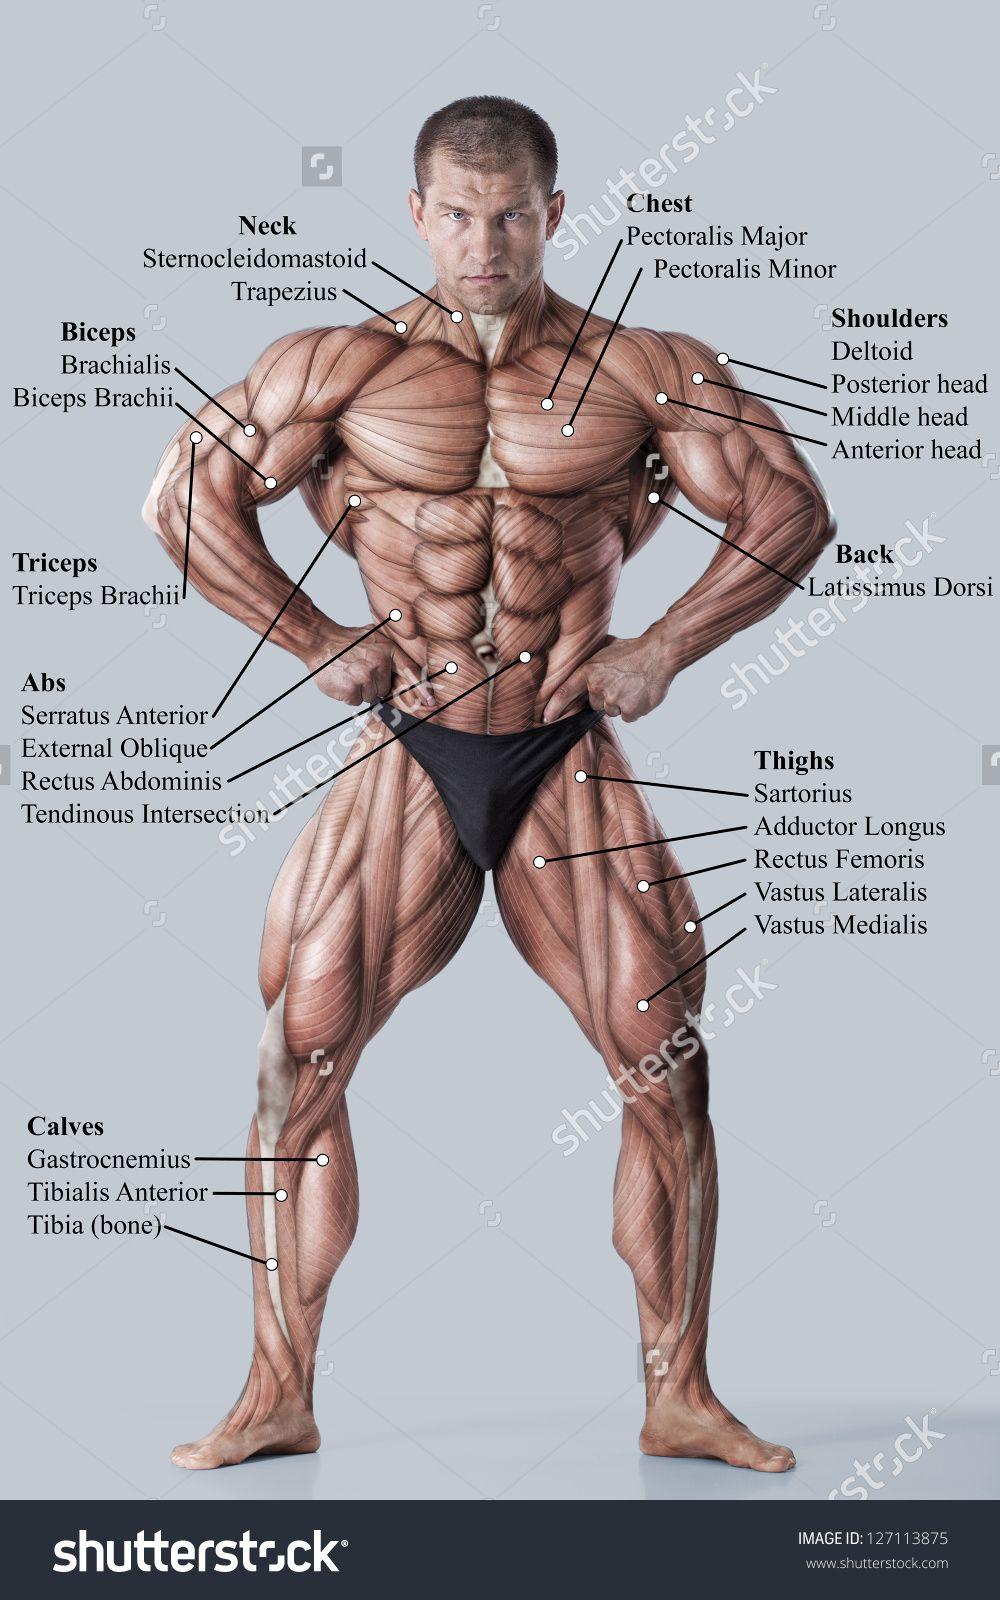 Muscle Chart Male Human Anatomy Study Muscle Names Muscle